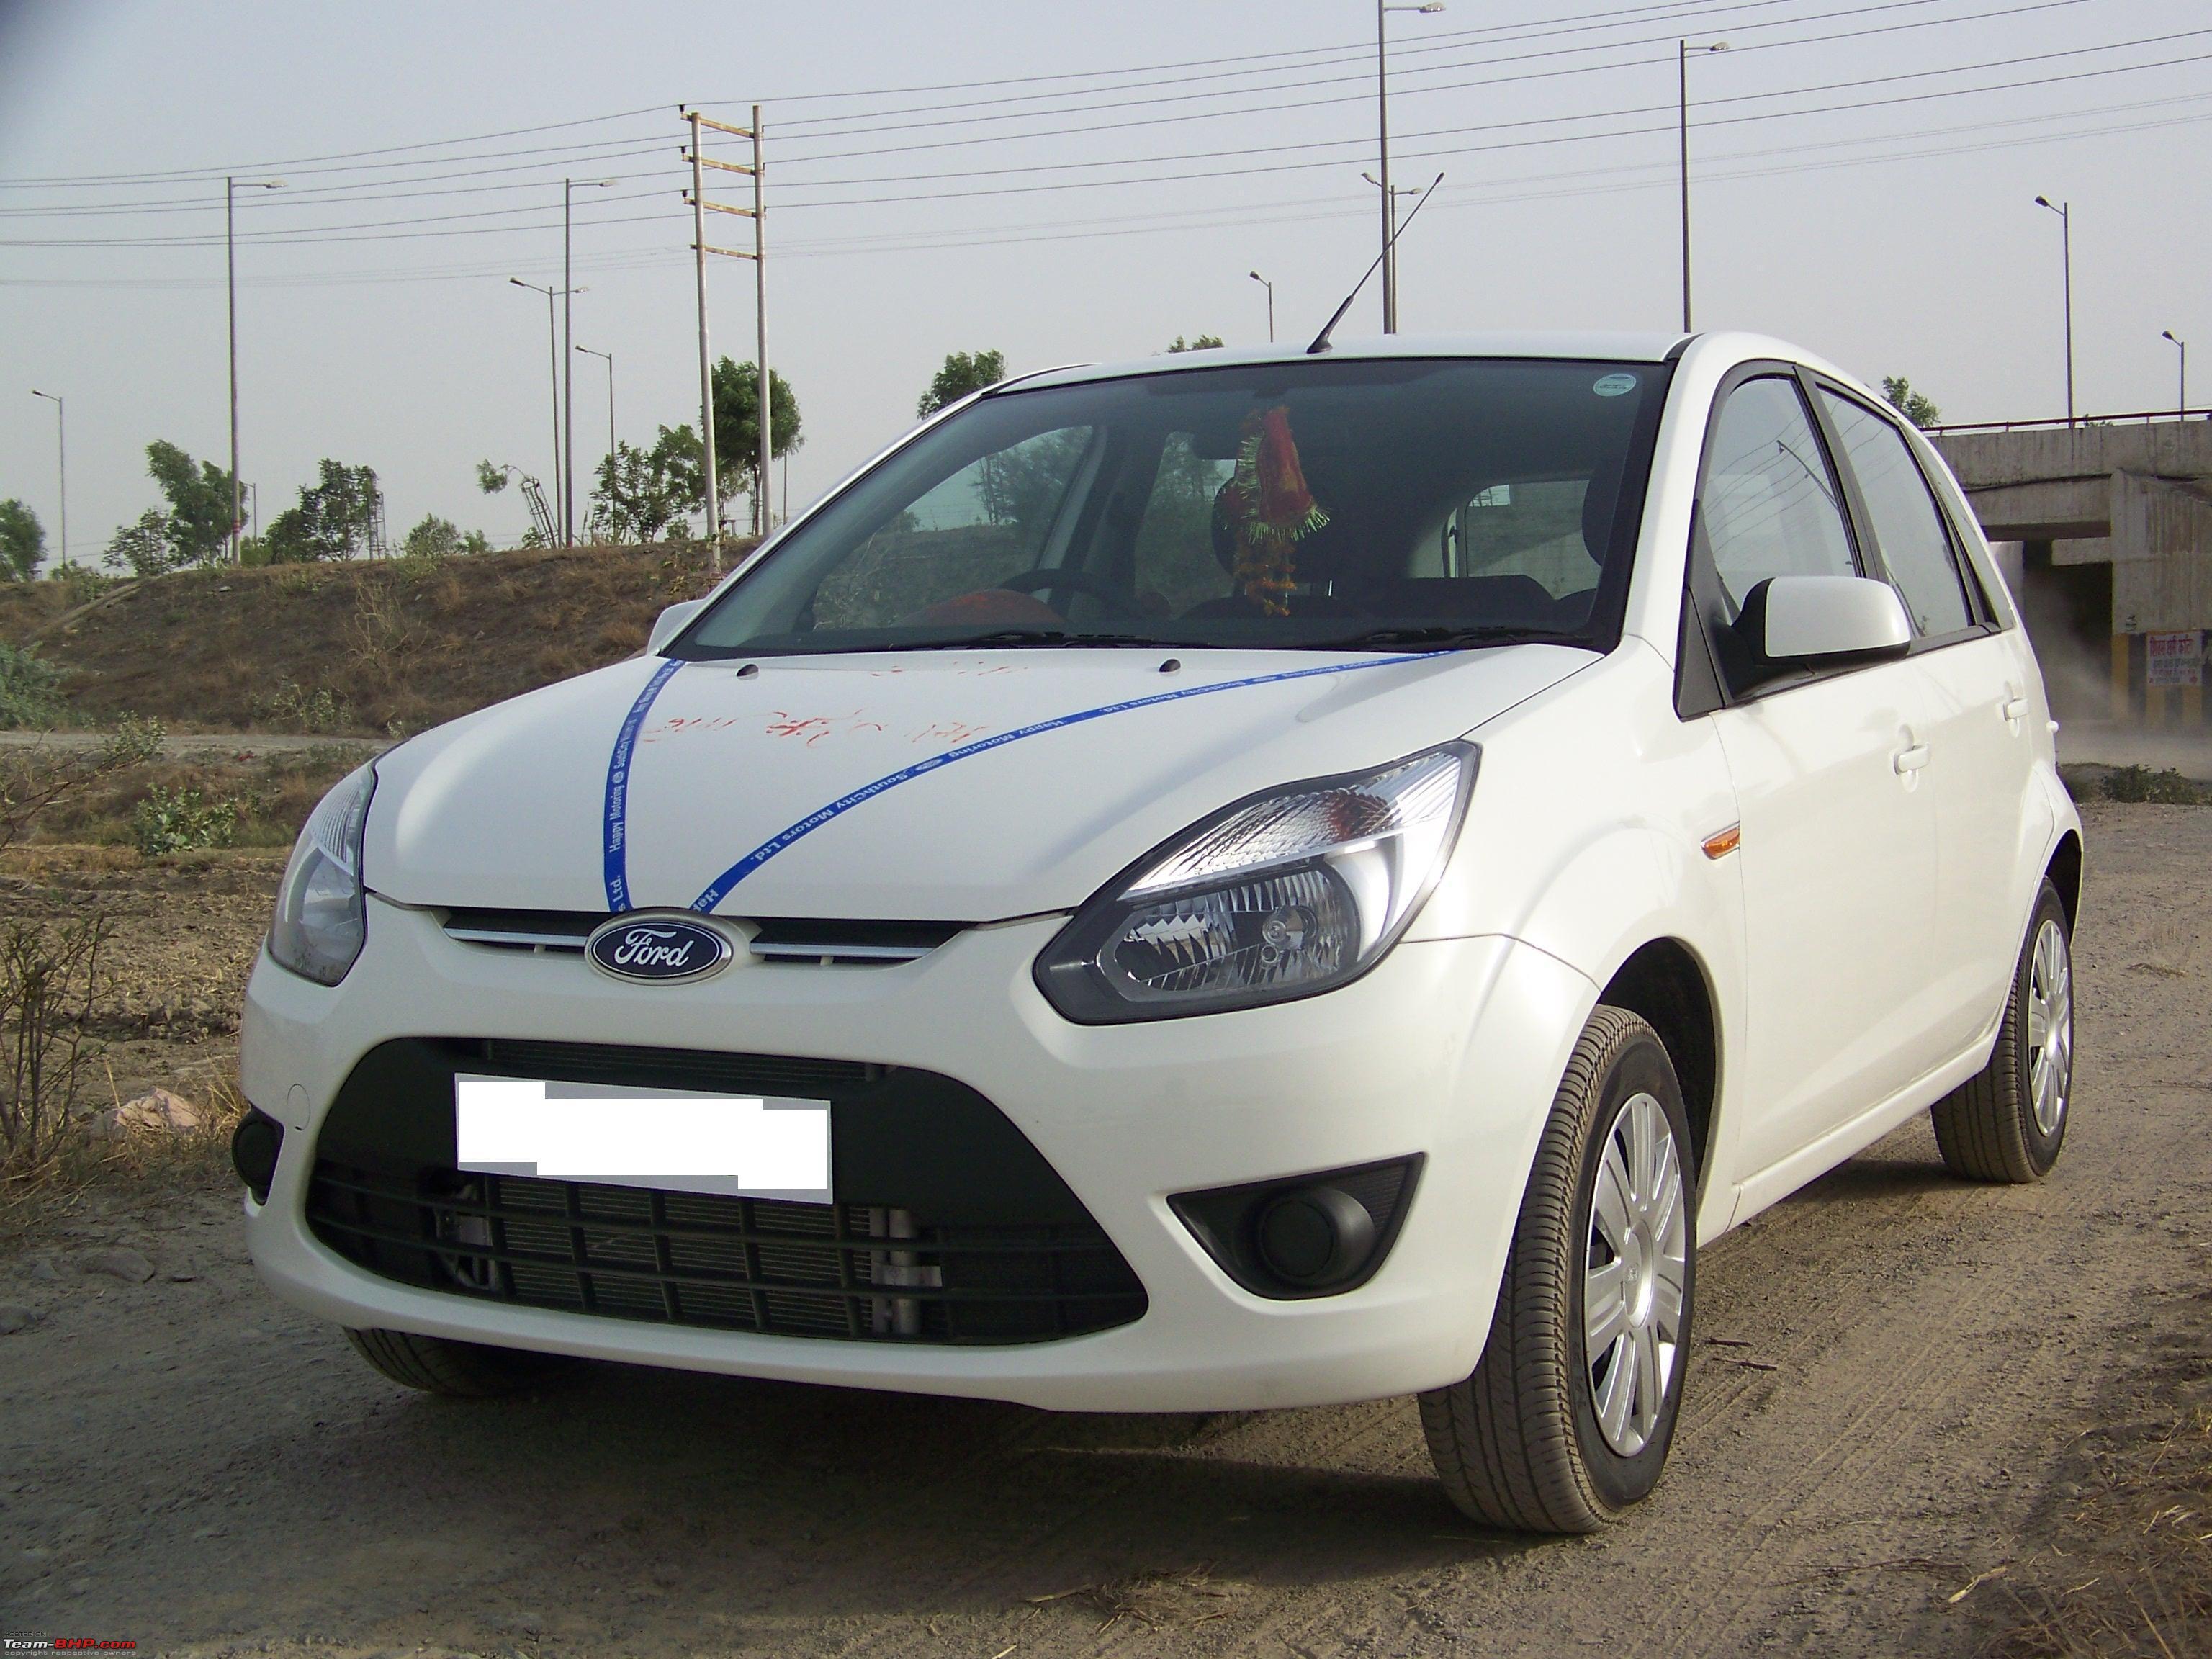 Ford Figo 1 4 Tdci Titanium My First Car It S White